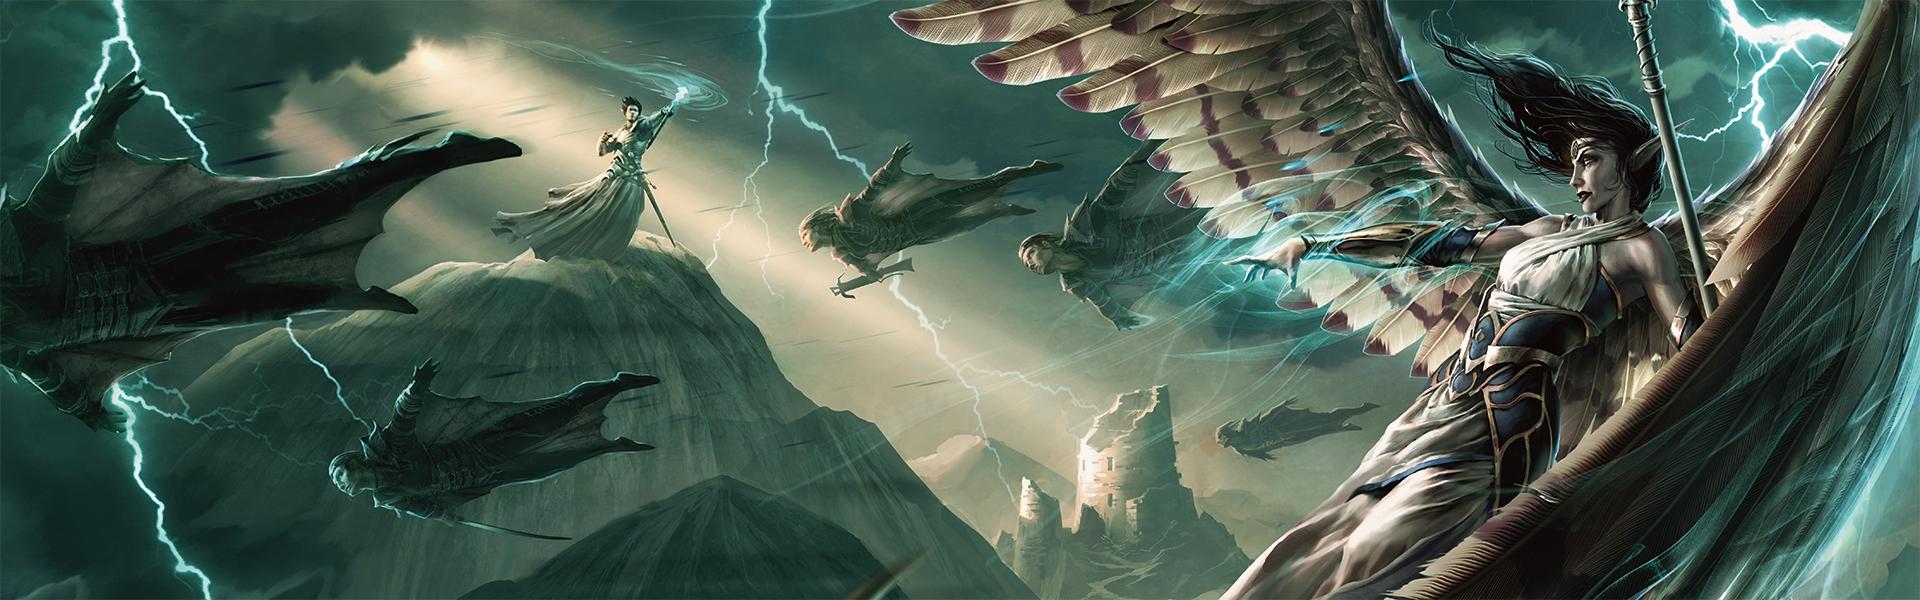 d d s latest storyline elemental evil